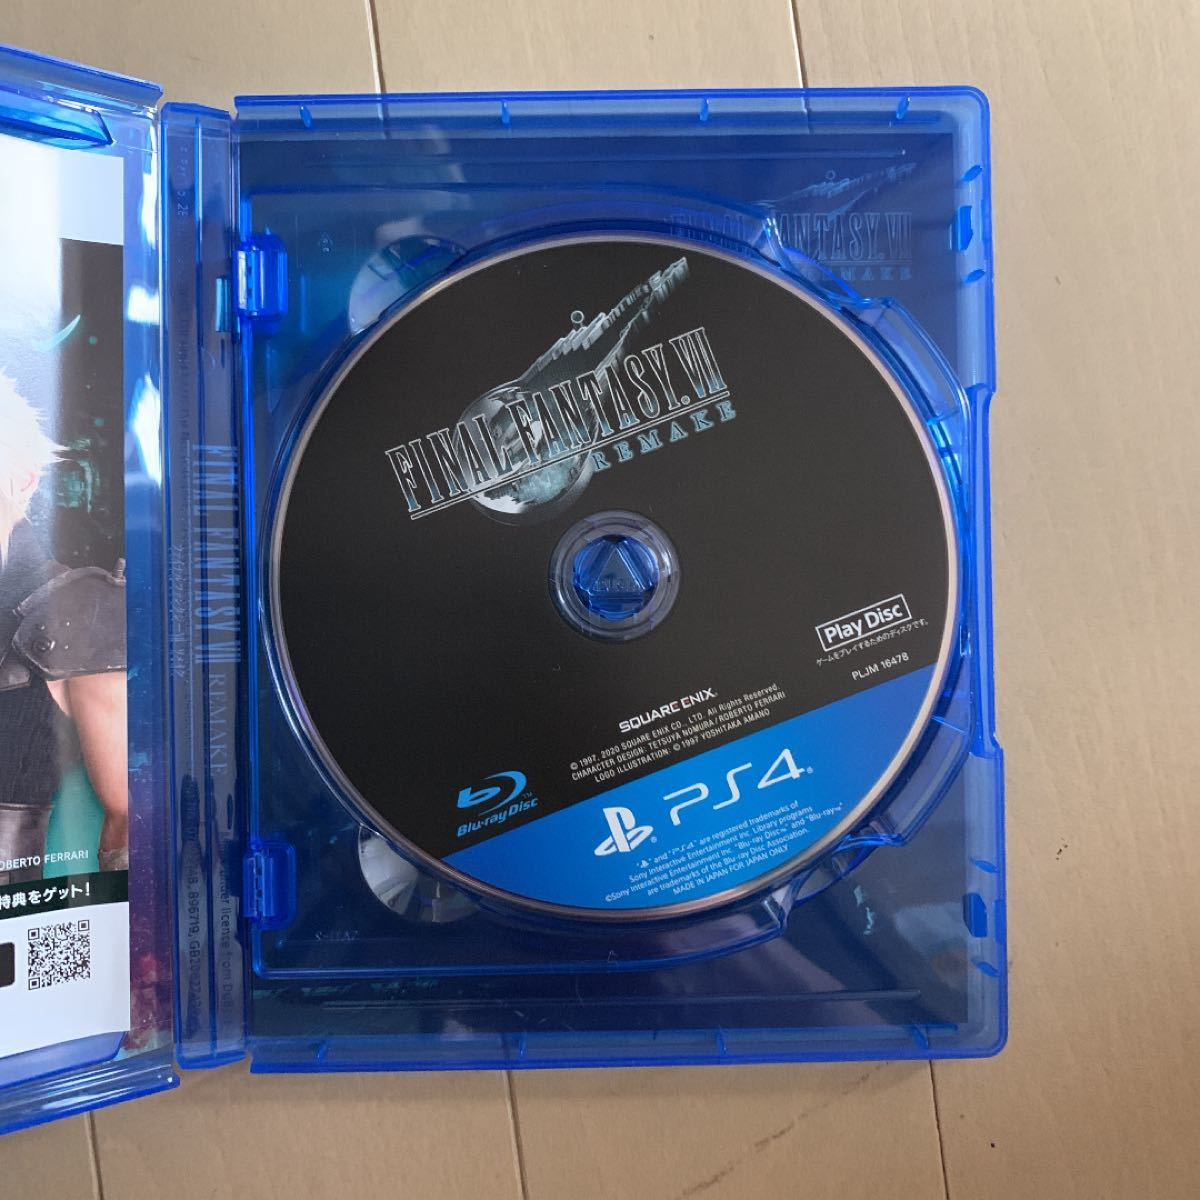 FF7  ファイナルファンタジー7  PS4  スクウェアエニックス